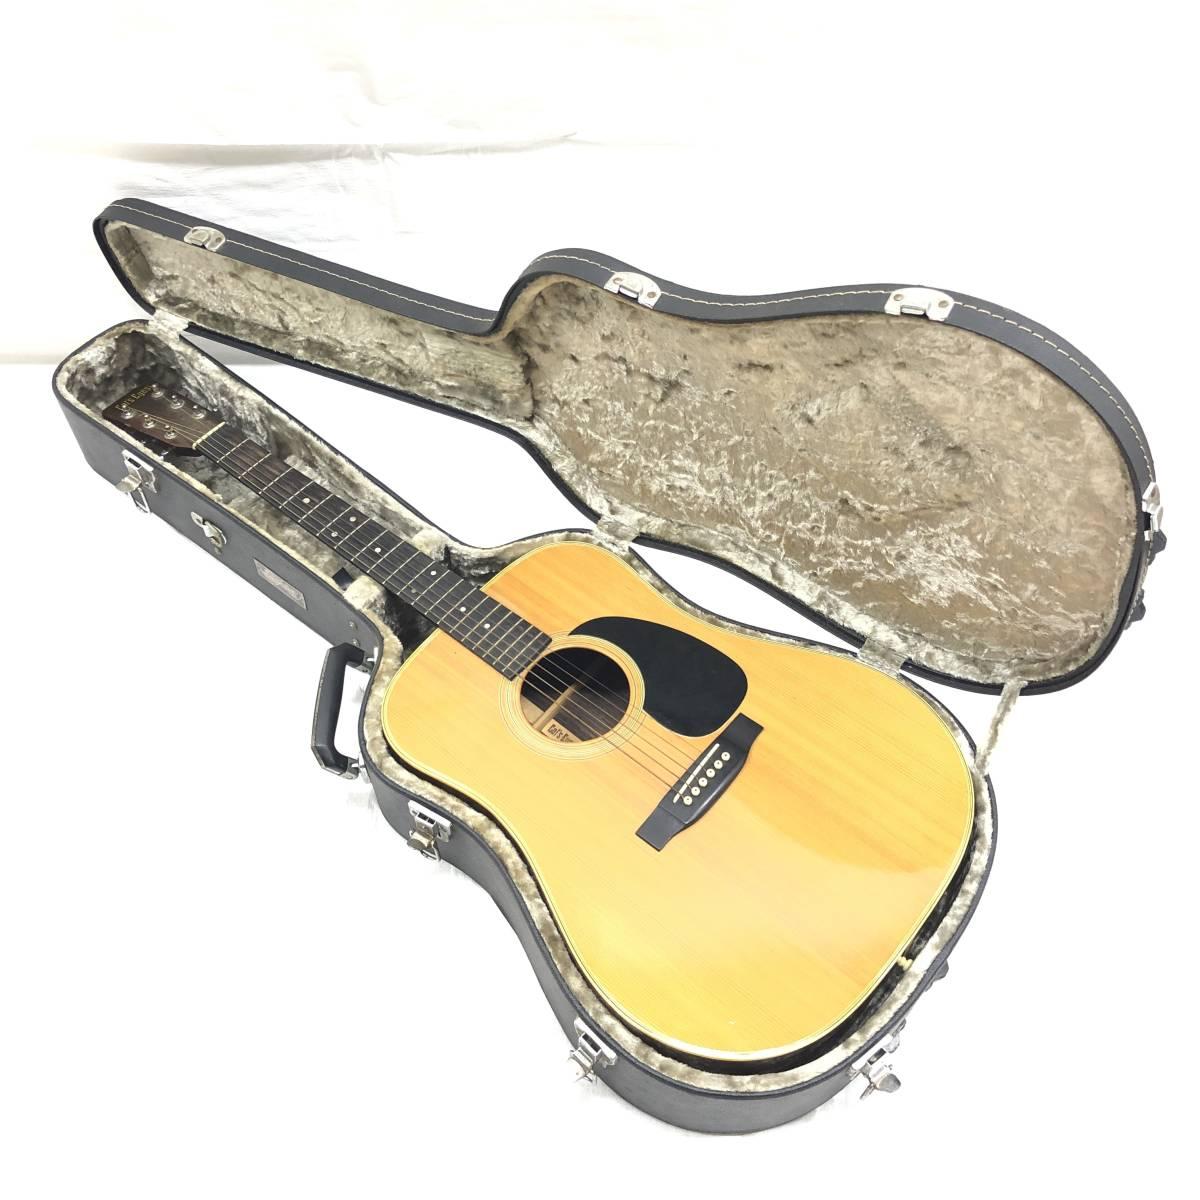 【SS】TOKAI トーカイ 東海楽器 Cat's Eyes MODEL CE500CF キャッツアイ ギターケース ハードケース 動作未確認 中古 レトロ ヴィンテージ